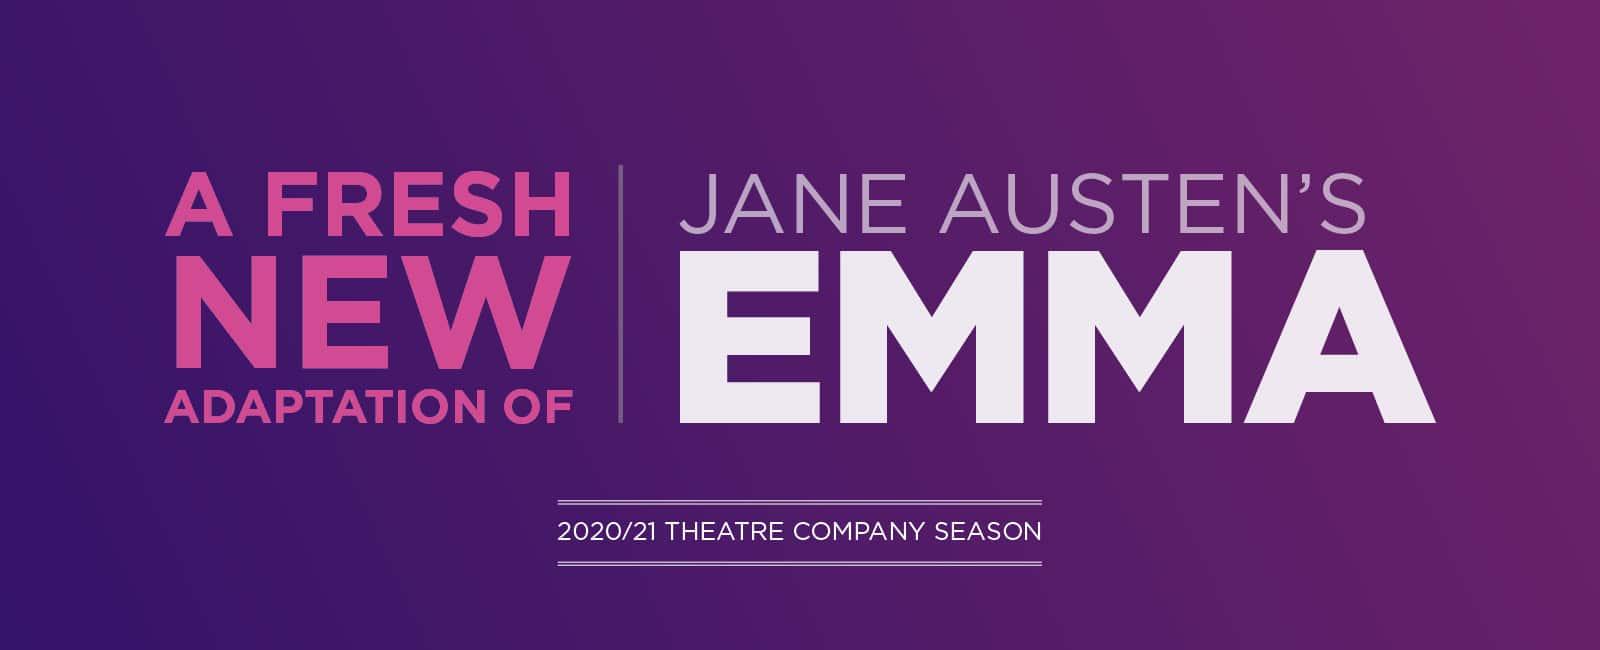 A Fresh New Adaptation of Jane Austen's Emma